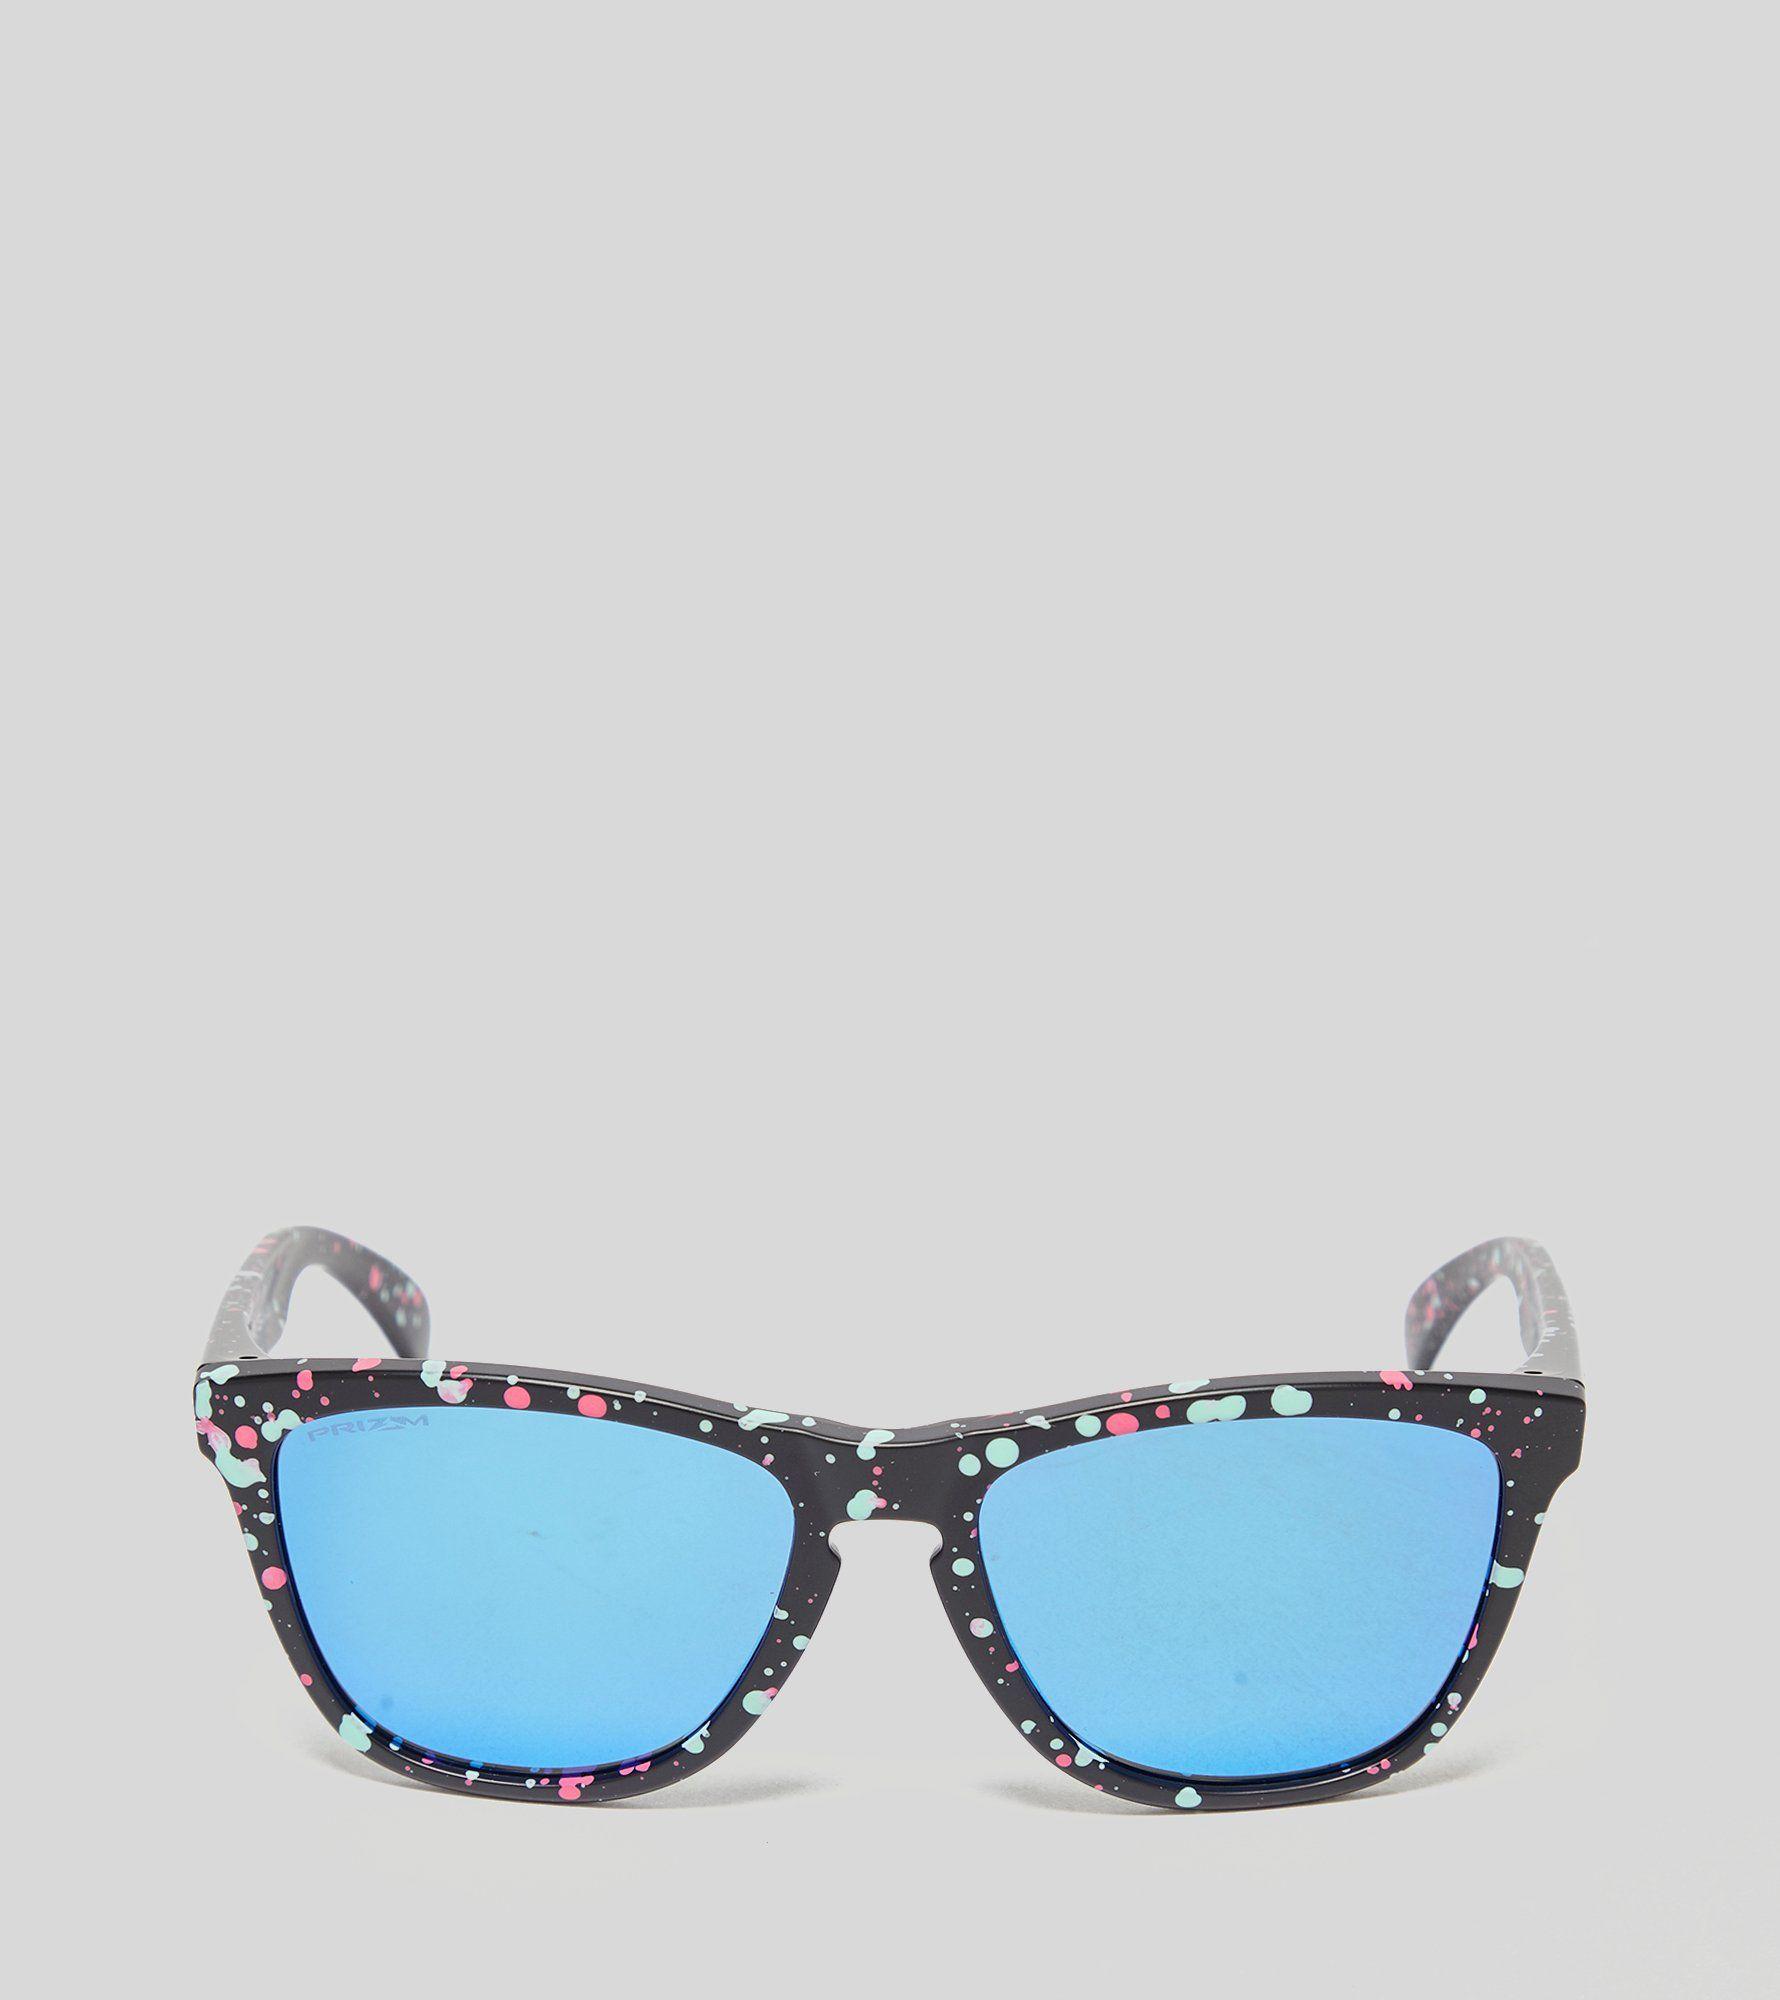 Oakley Frogskins Splatterfade Collection Sunglasses